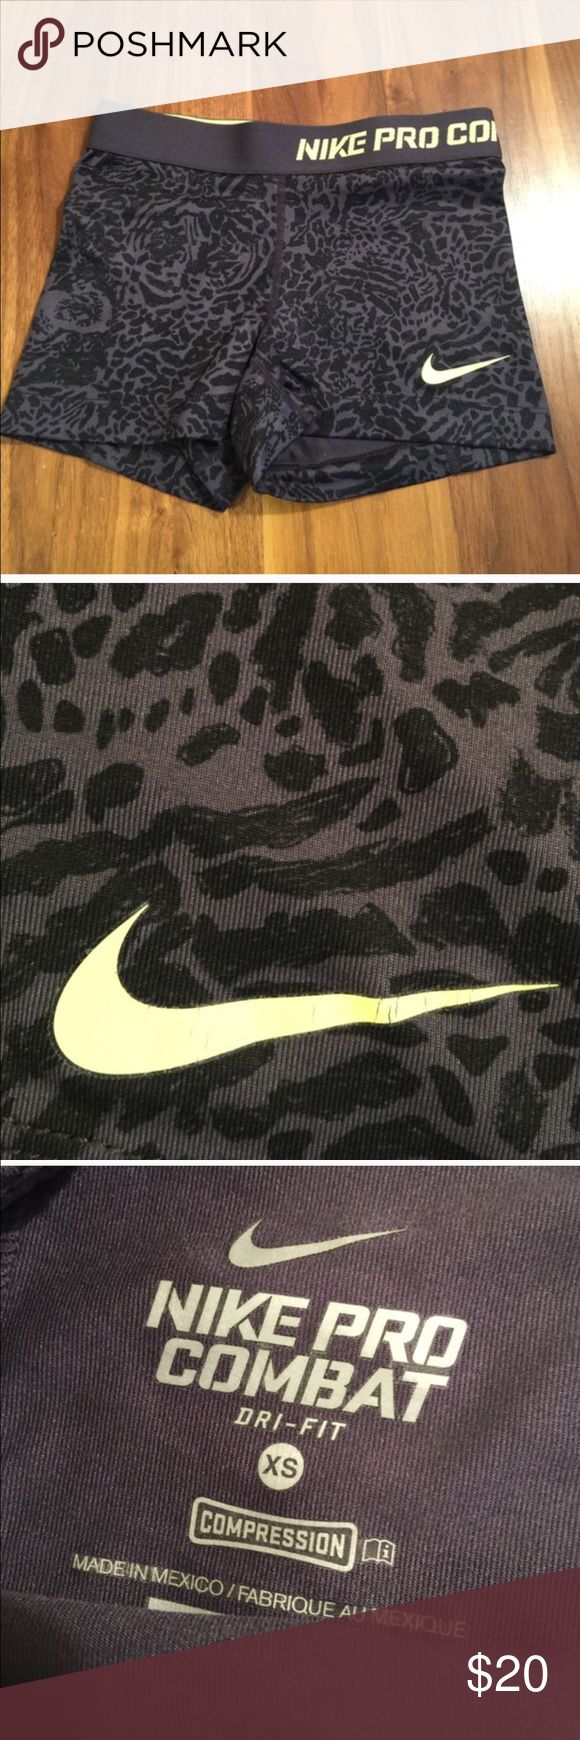 Nike Pro Combat Compression Shorts Black print compression shorts. Logo has slight cracking. Nike Shorts